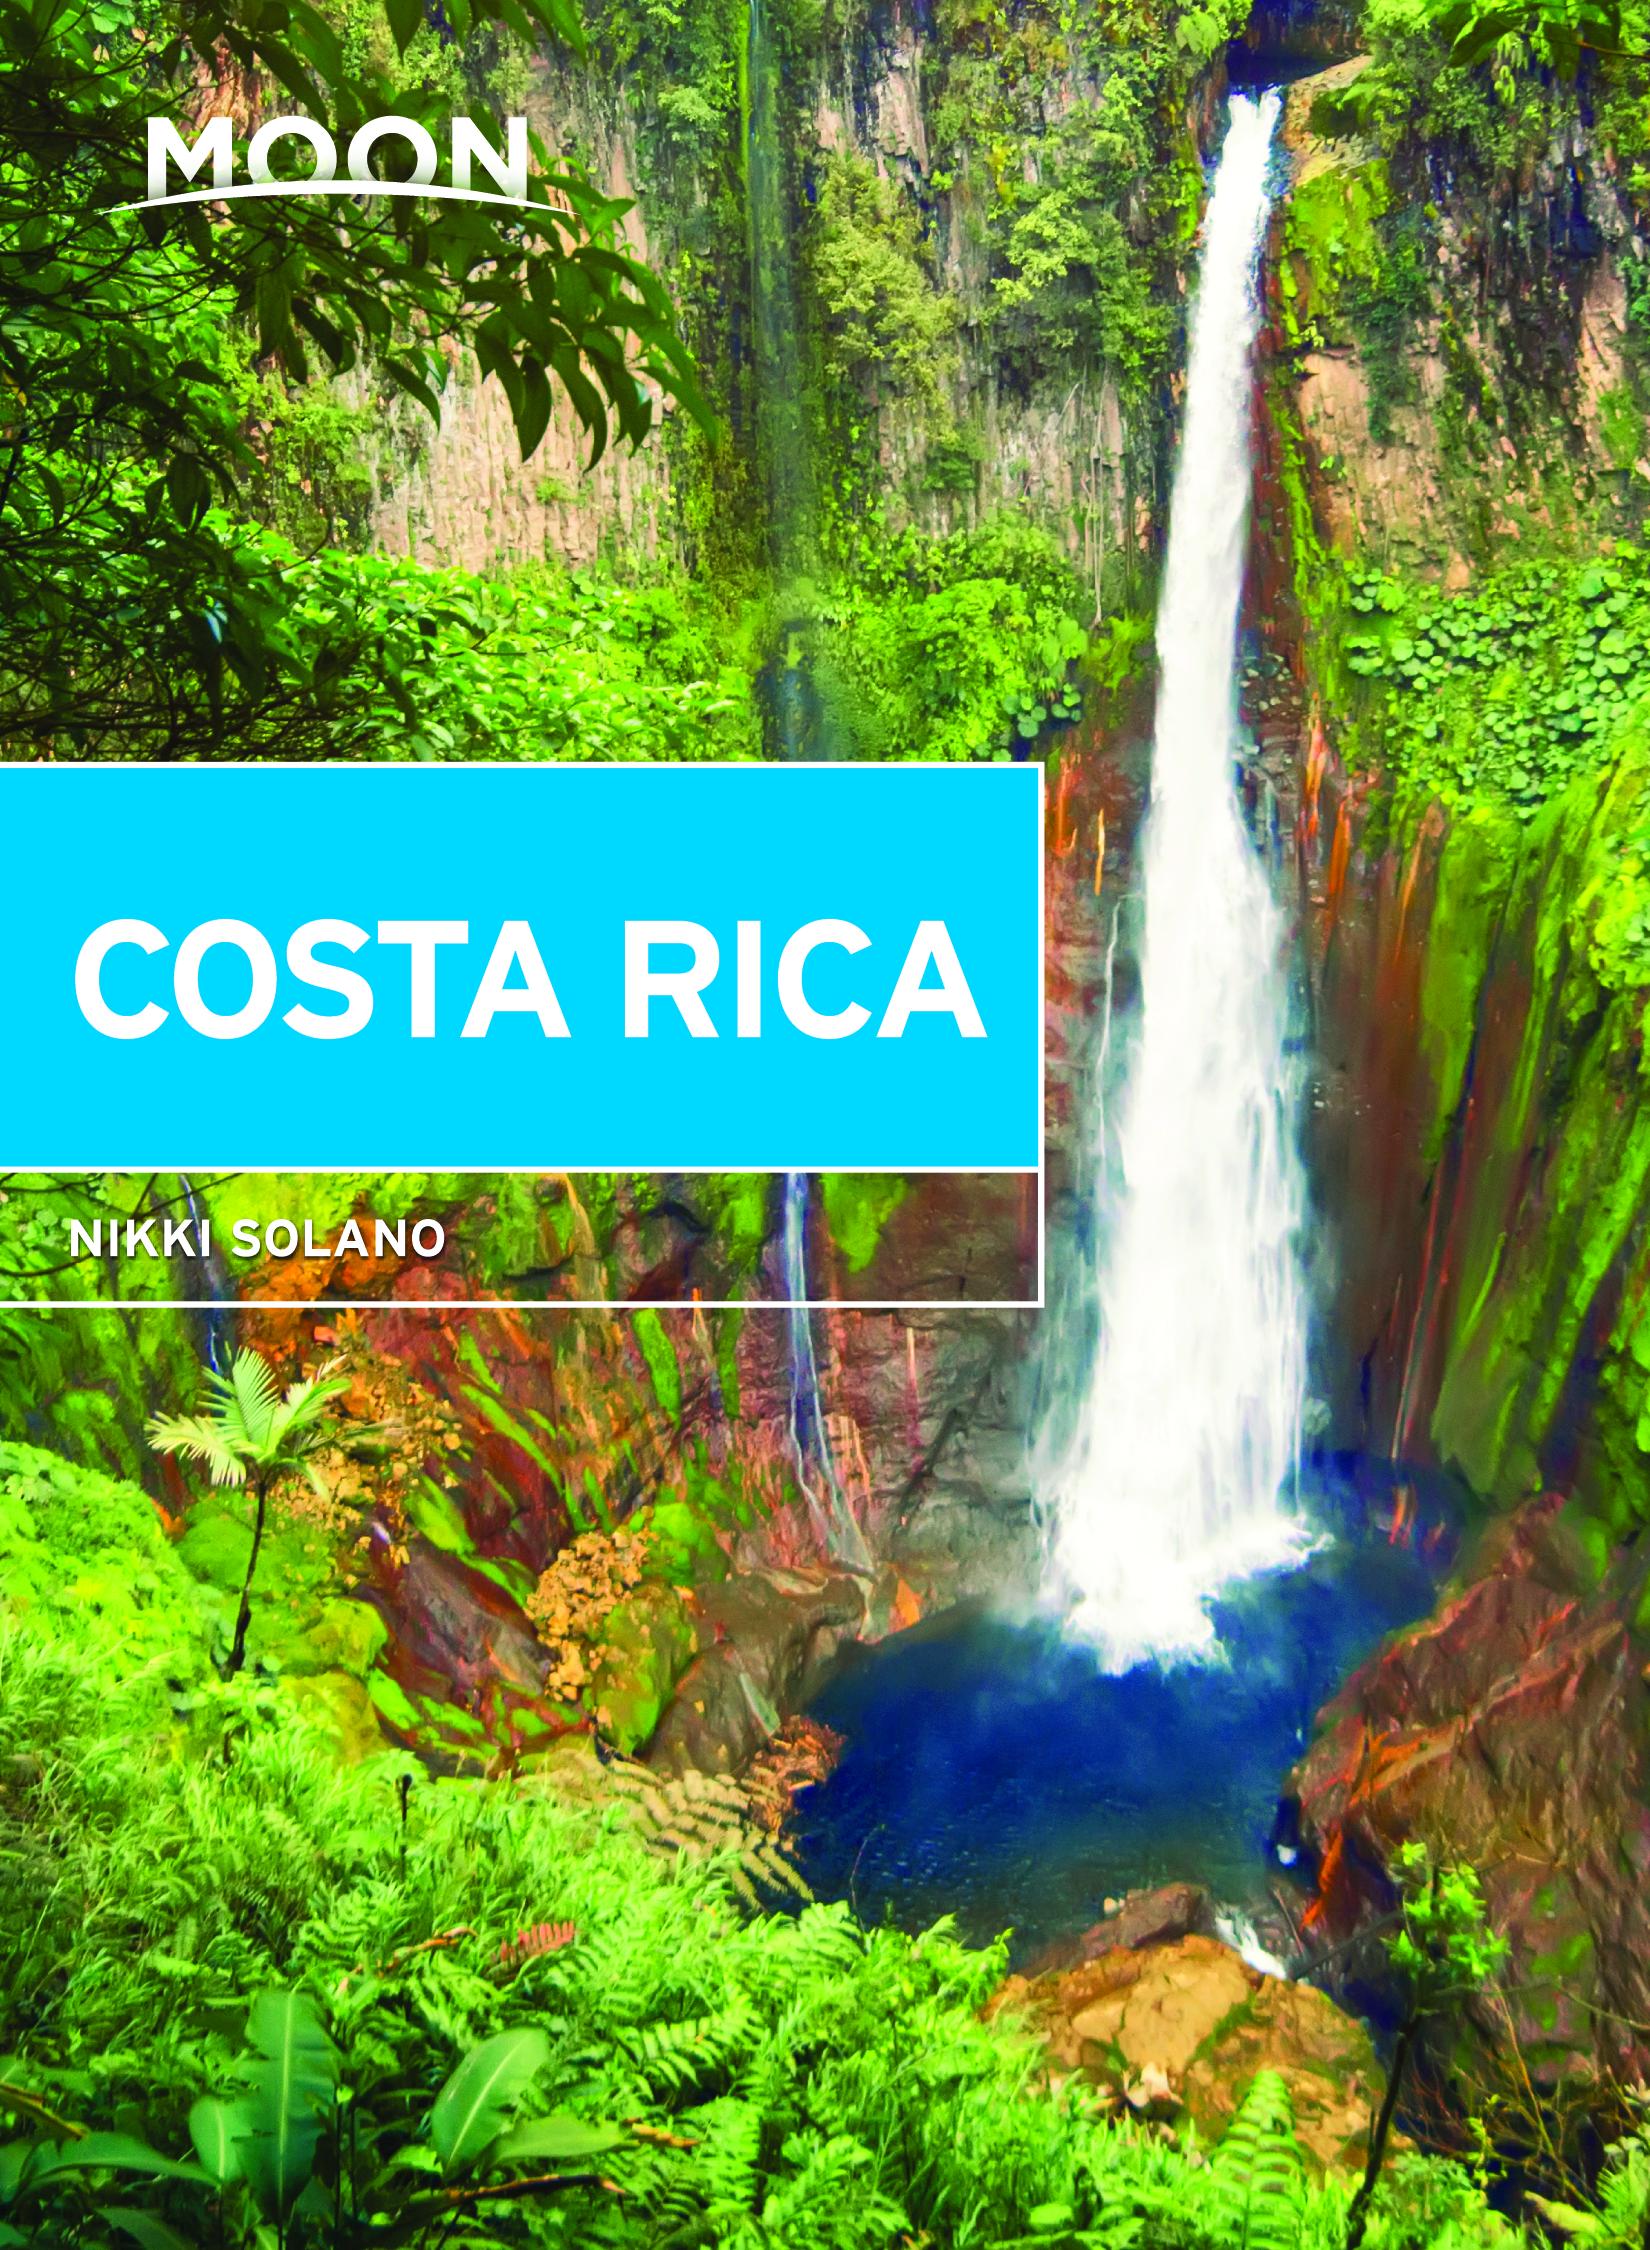 Moon Costa Rica 2019